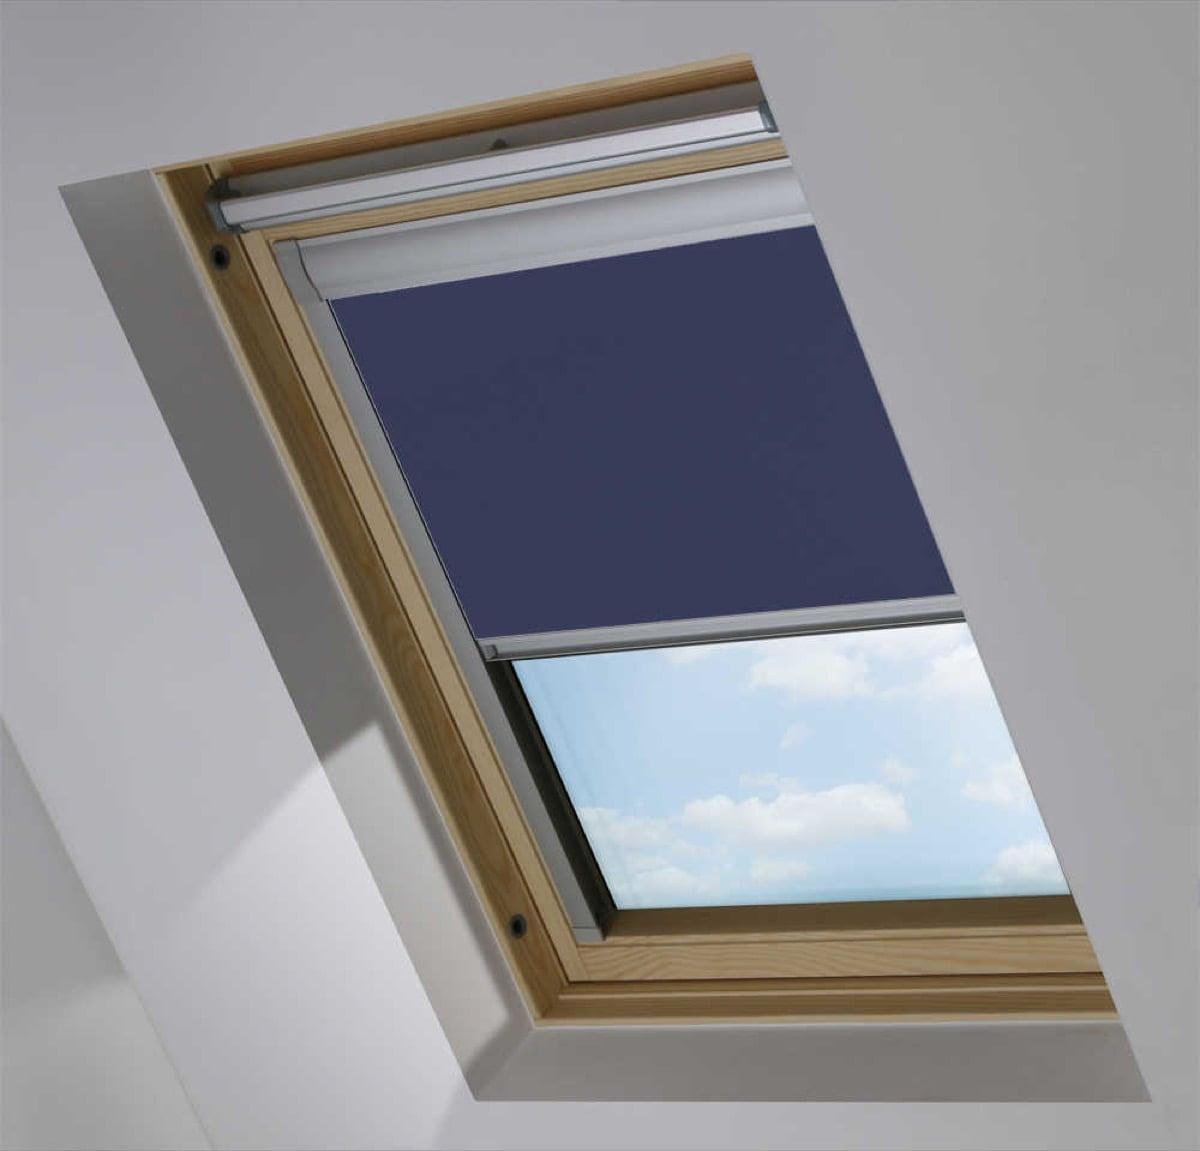 Dachfensterrollos nach Maß